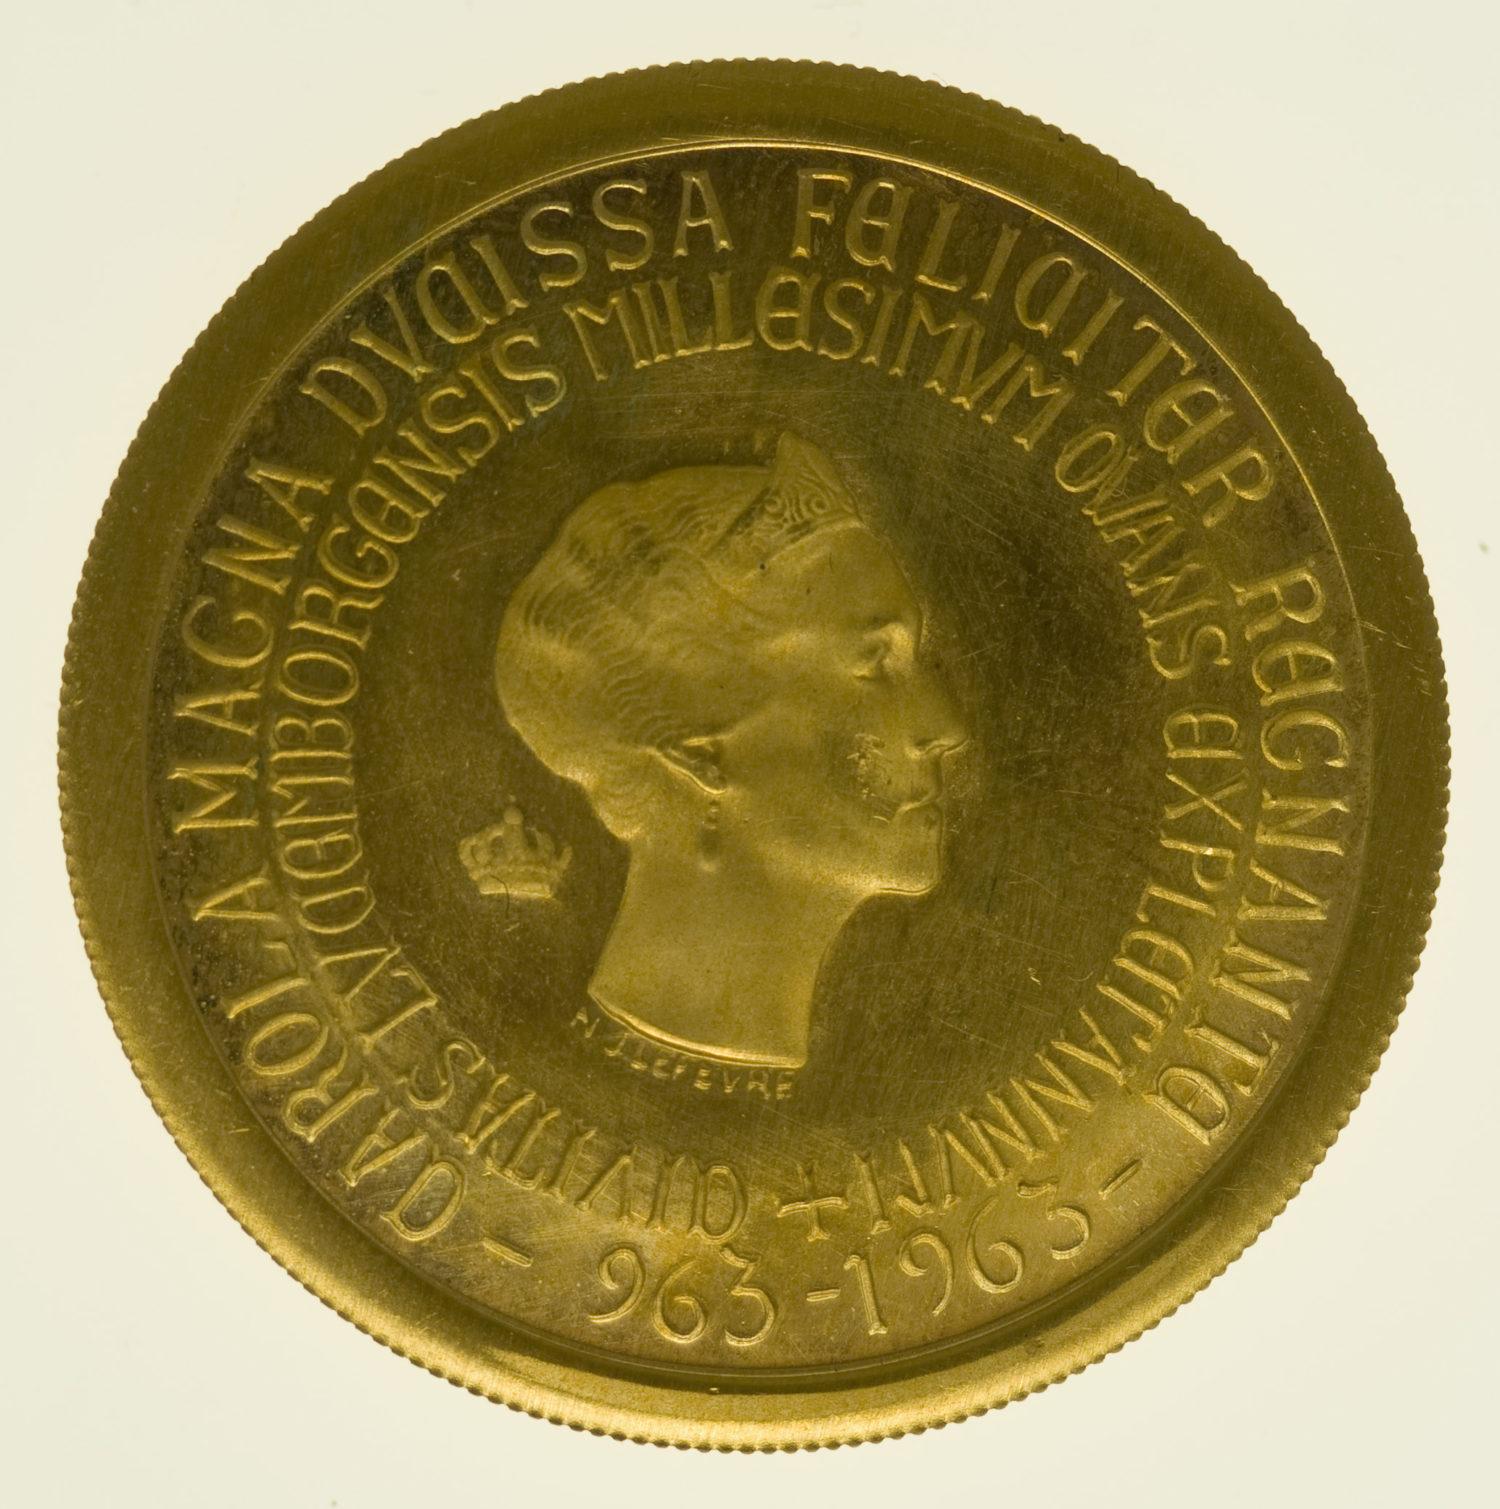 luxemburg - Luxemburg Charlotte Goldmedaille 1963